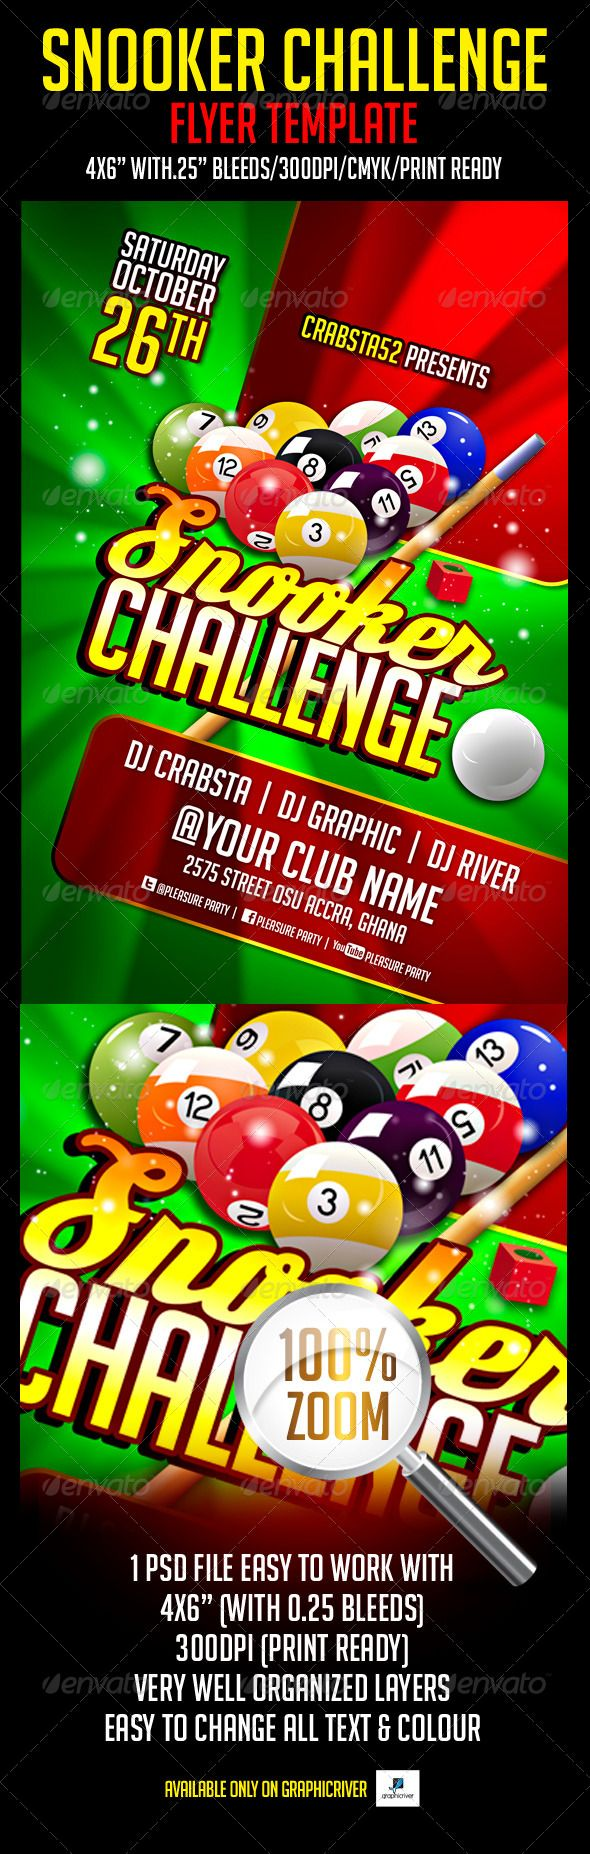 Snooker Challenge Flyer Template (Print Templates)